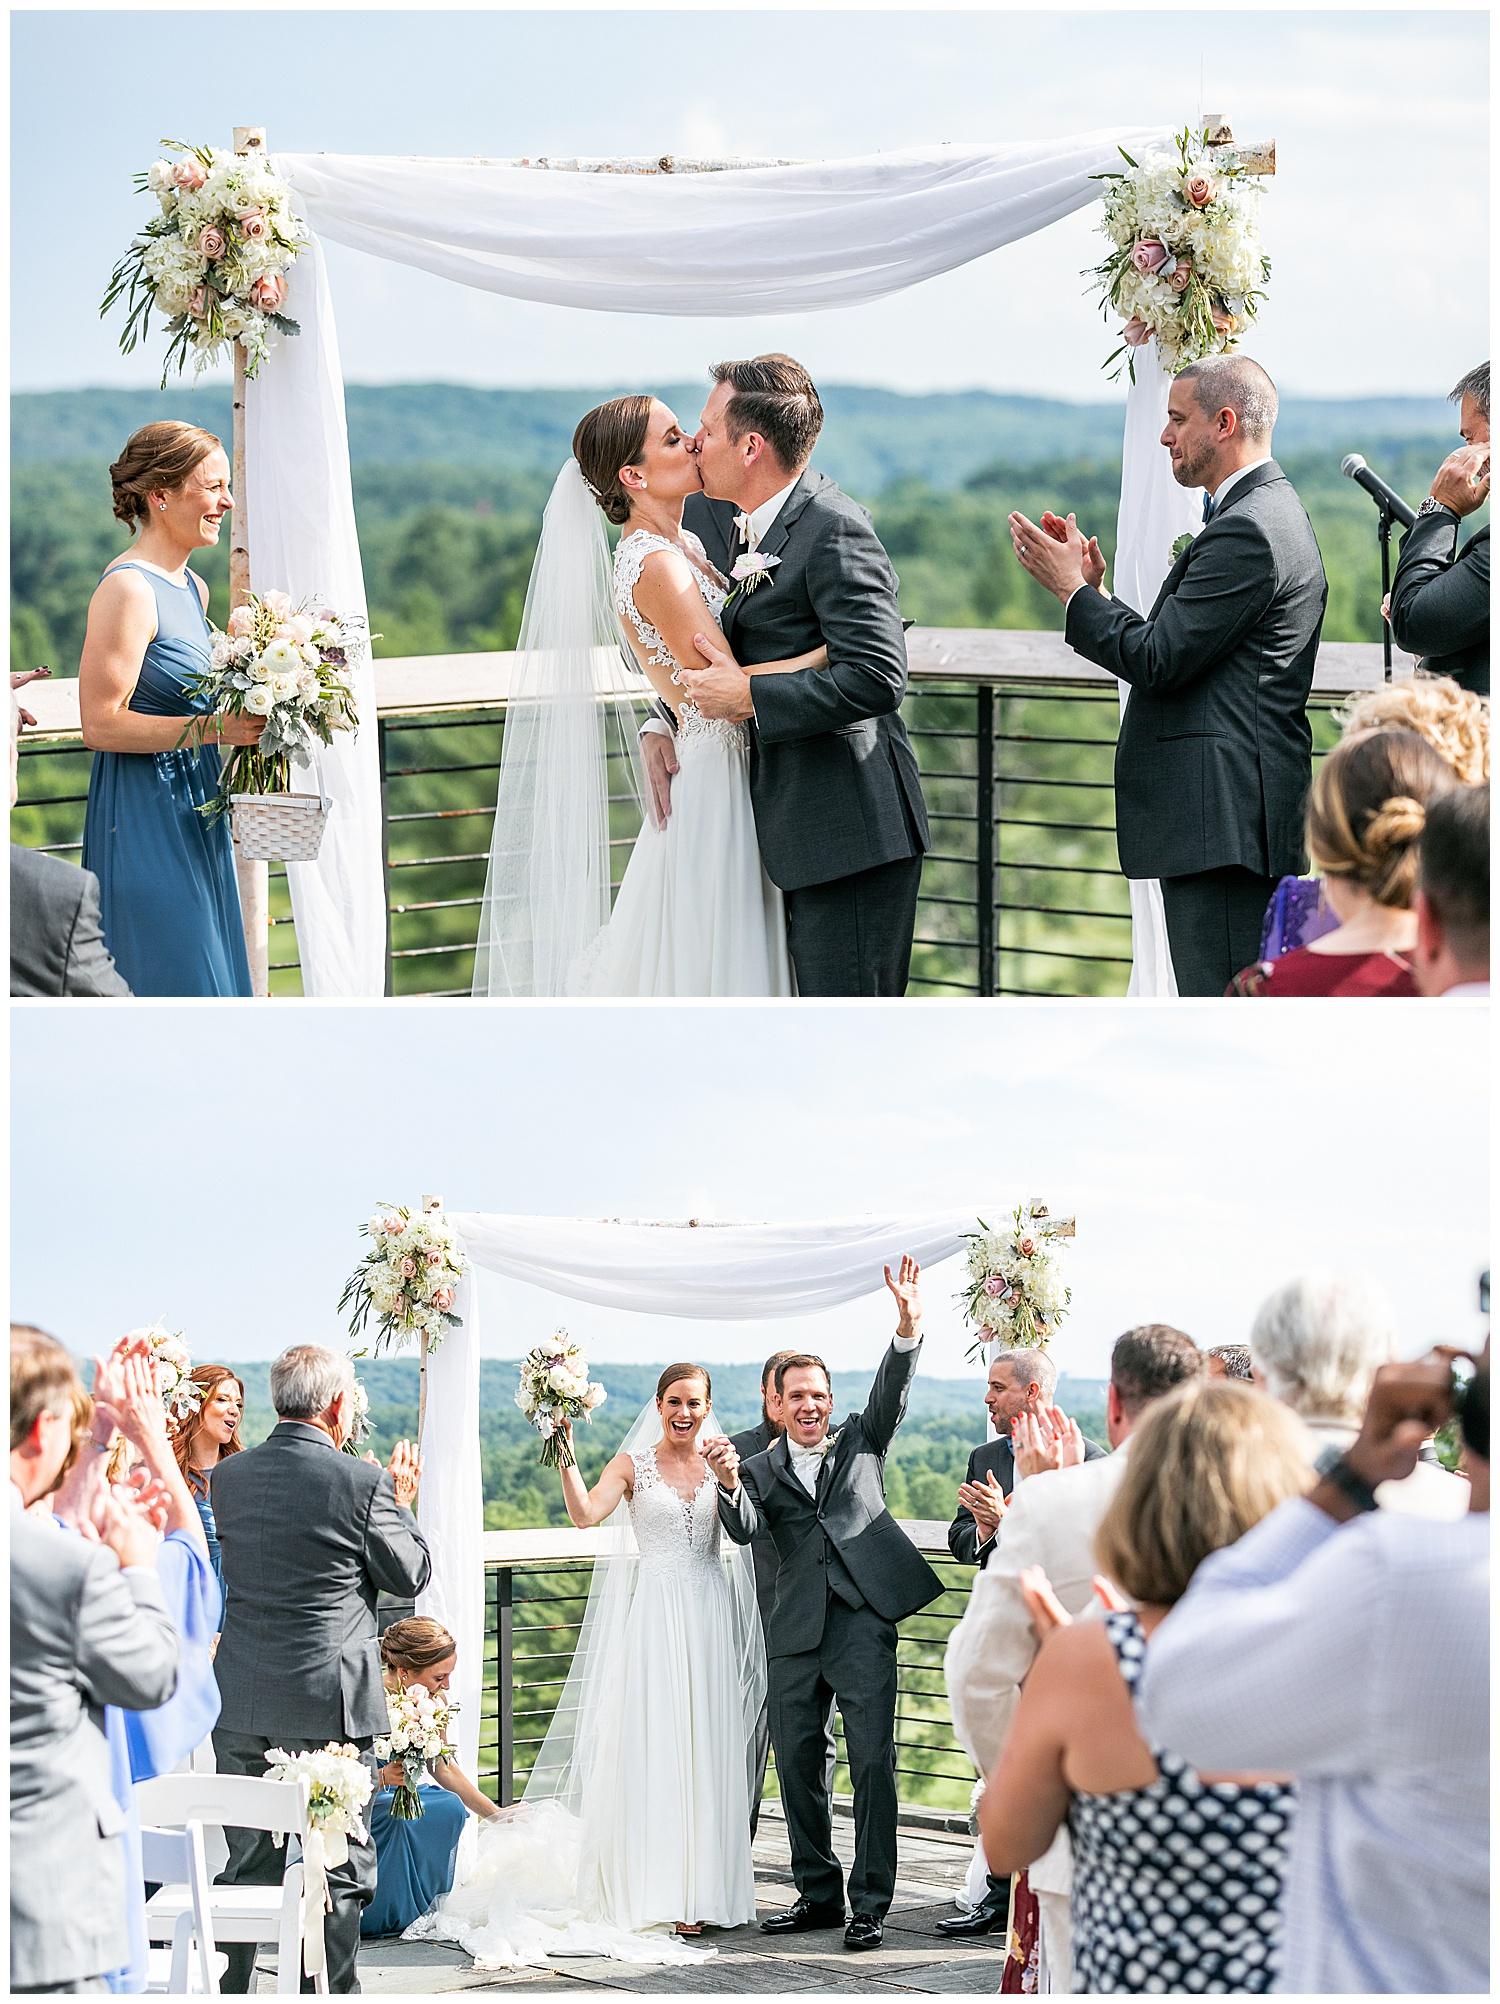 Lindsay Josh Eagles Nest Country Club Wedding Living Radiant Photography photos_0056.jpg